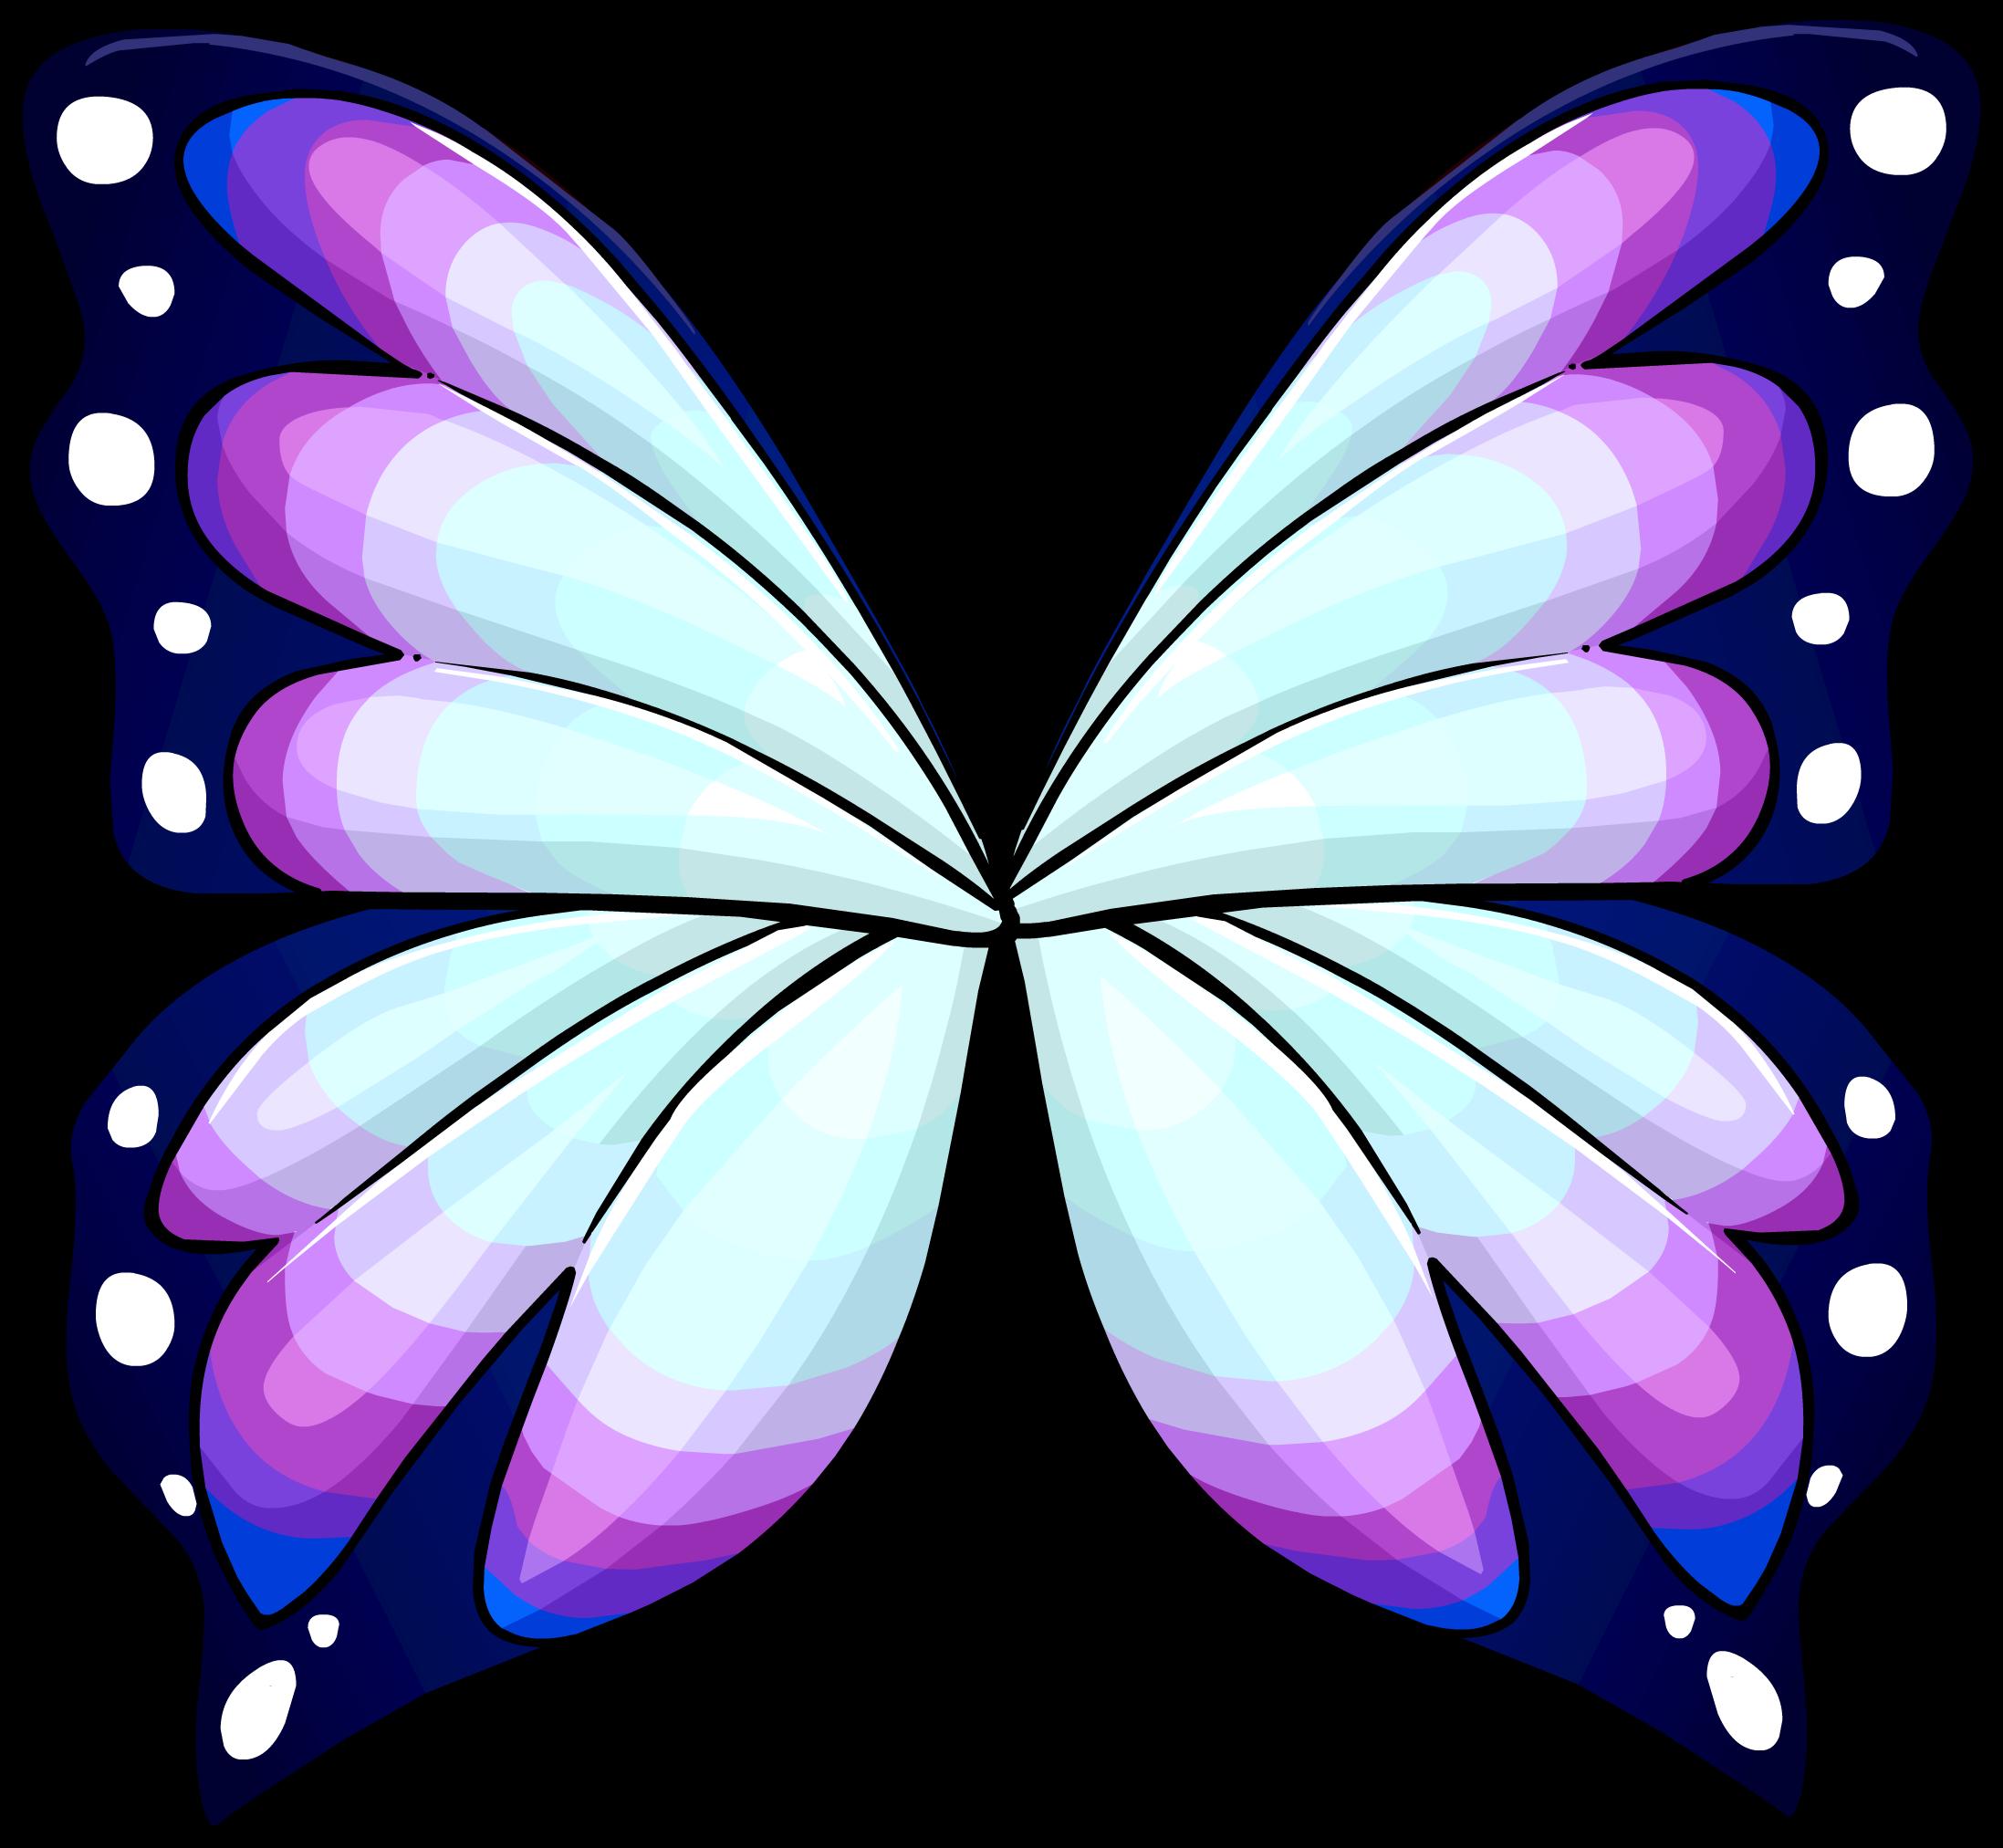 صور فراشة png - صور فراشات مفرغة بصيغة png Purple_Butterfly_Wings